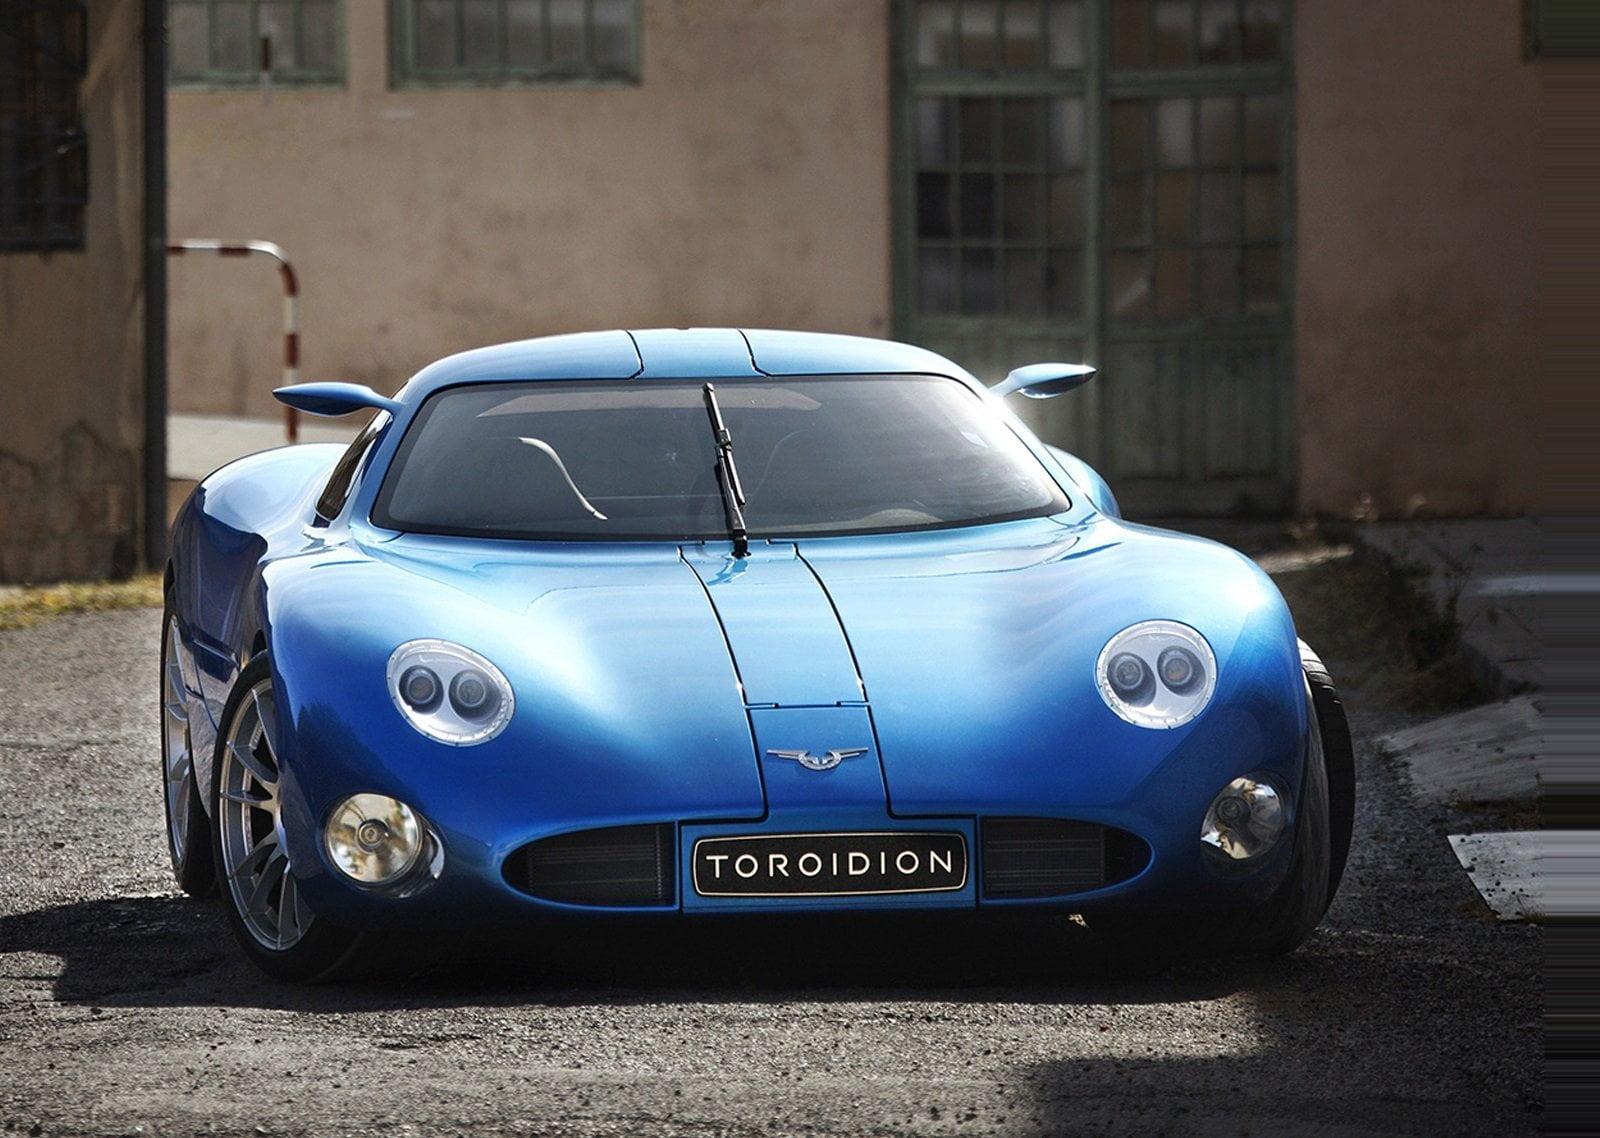 Monaco Cars Market